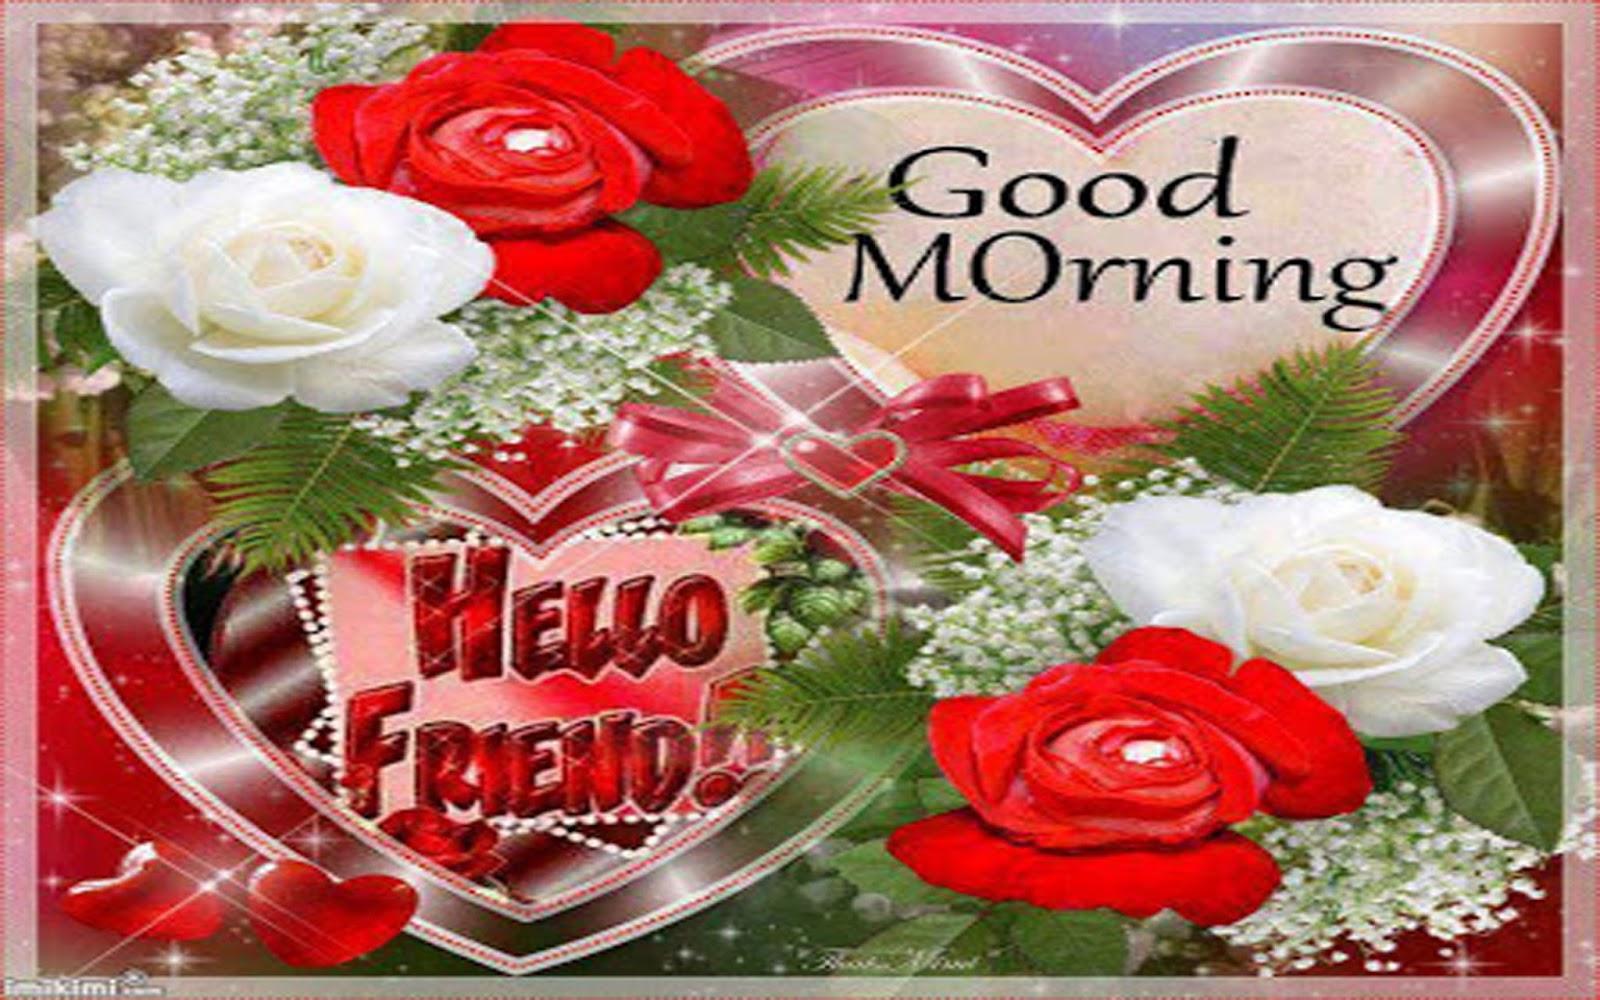 Wallpaper download good morning - Love Good Morning Image Hd